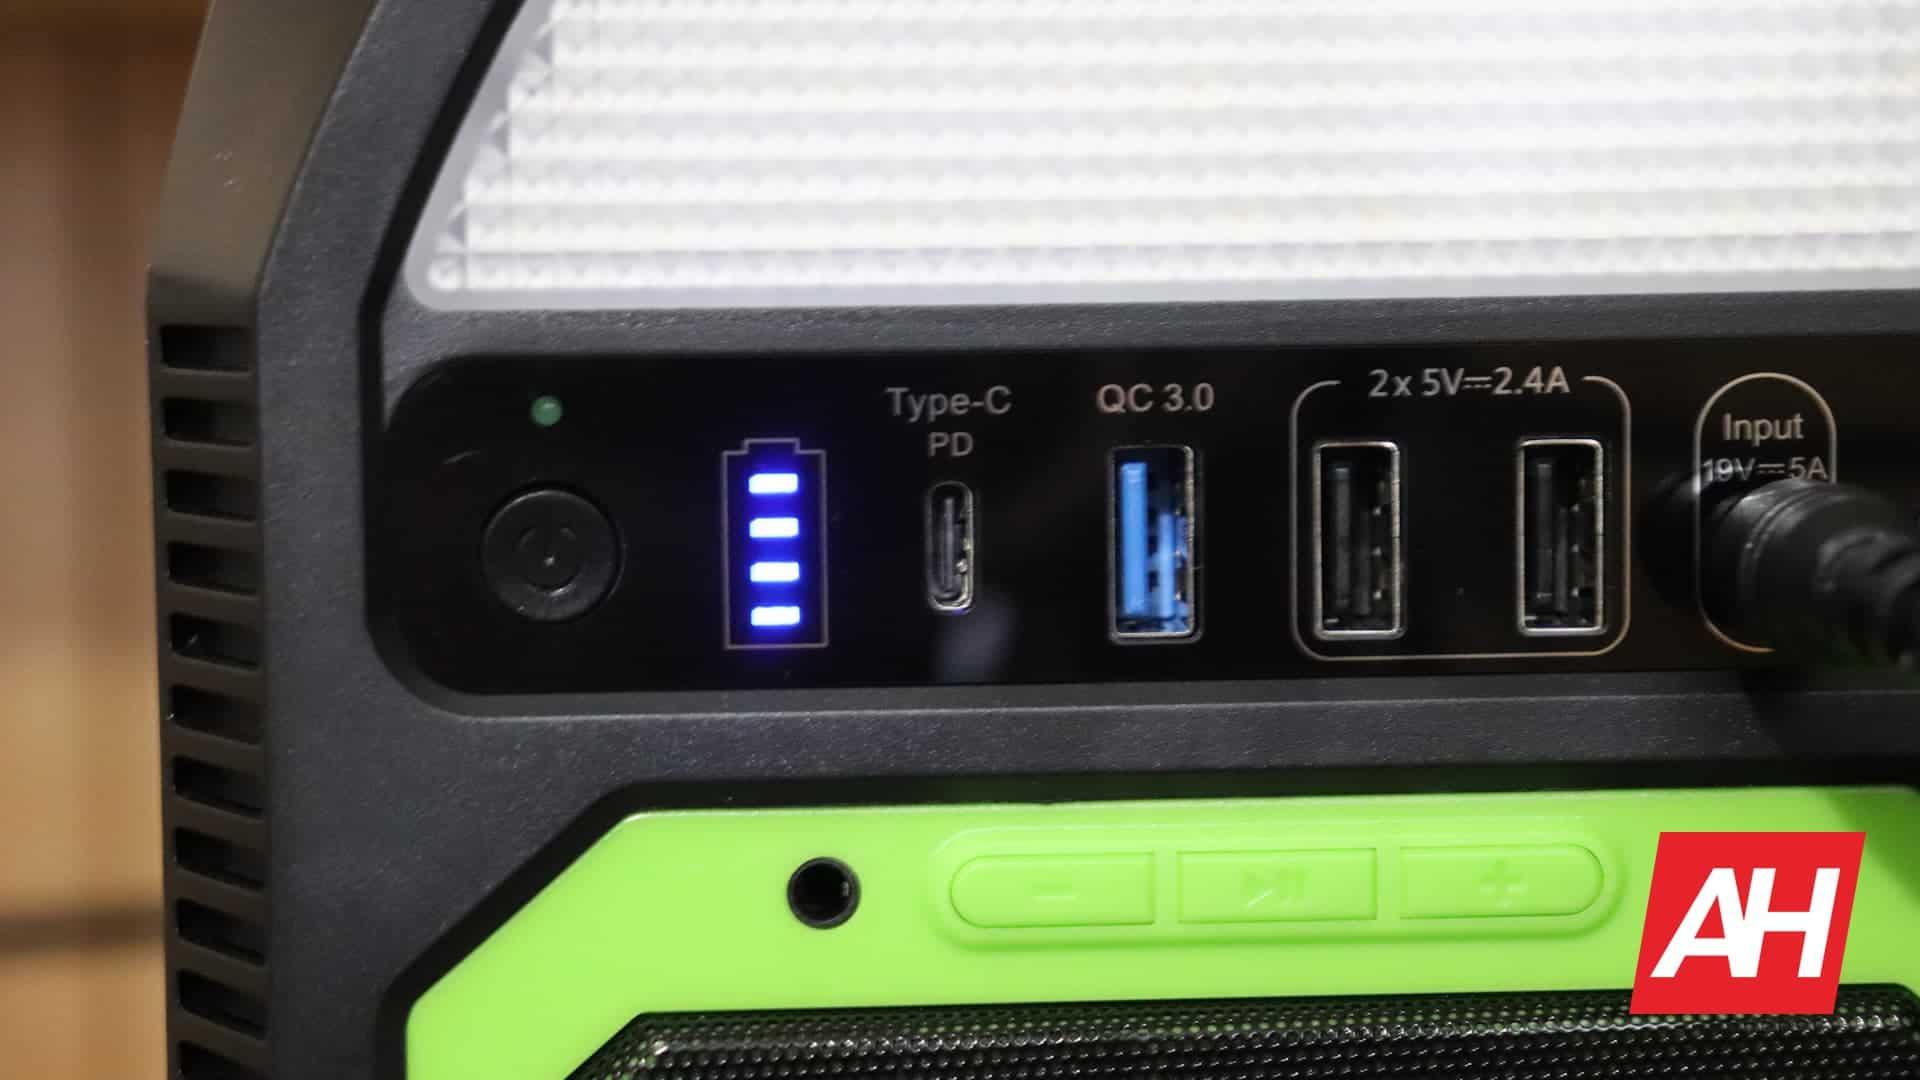 03 iForway PS500N Portable Powerstation battery DG AH 2020